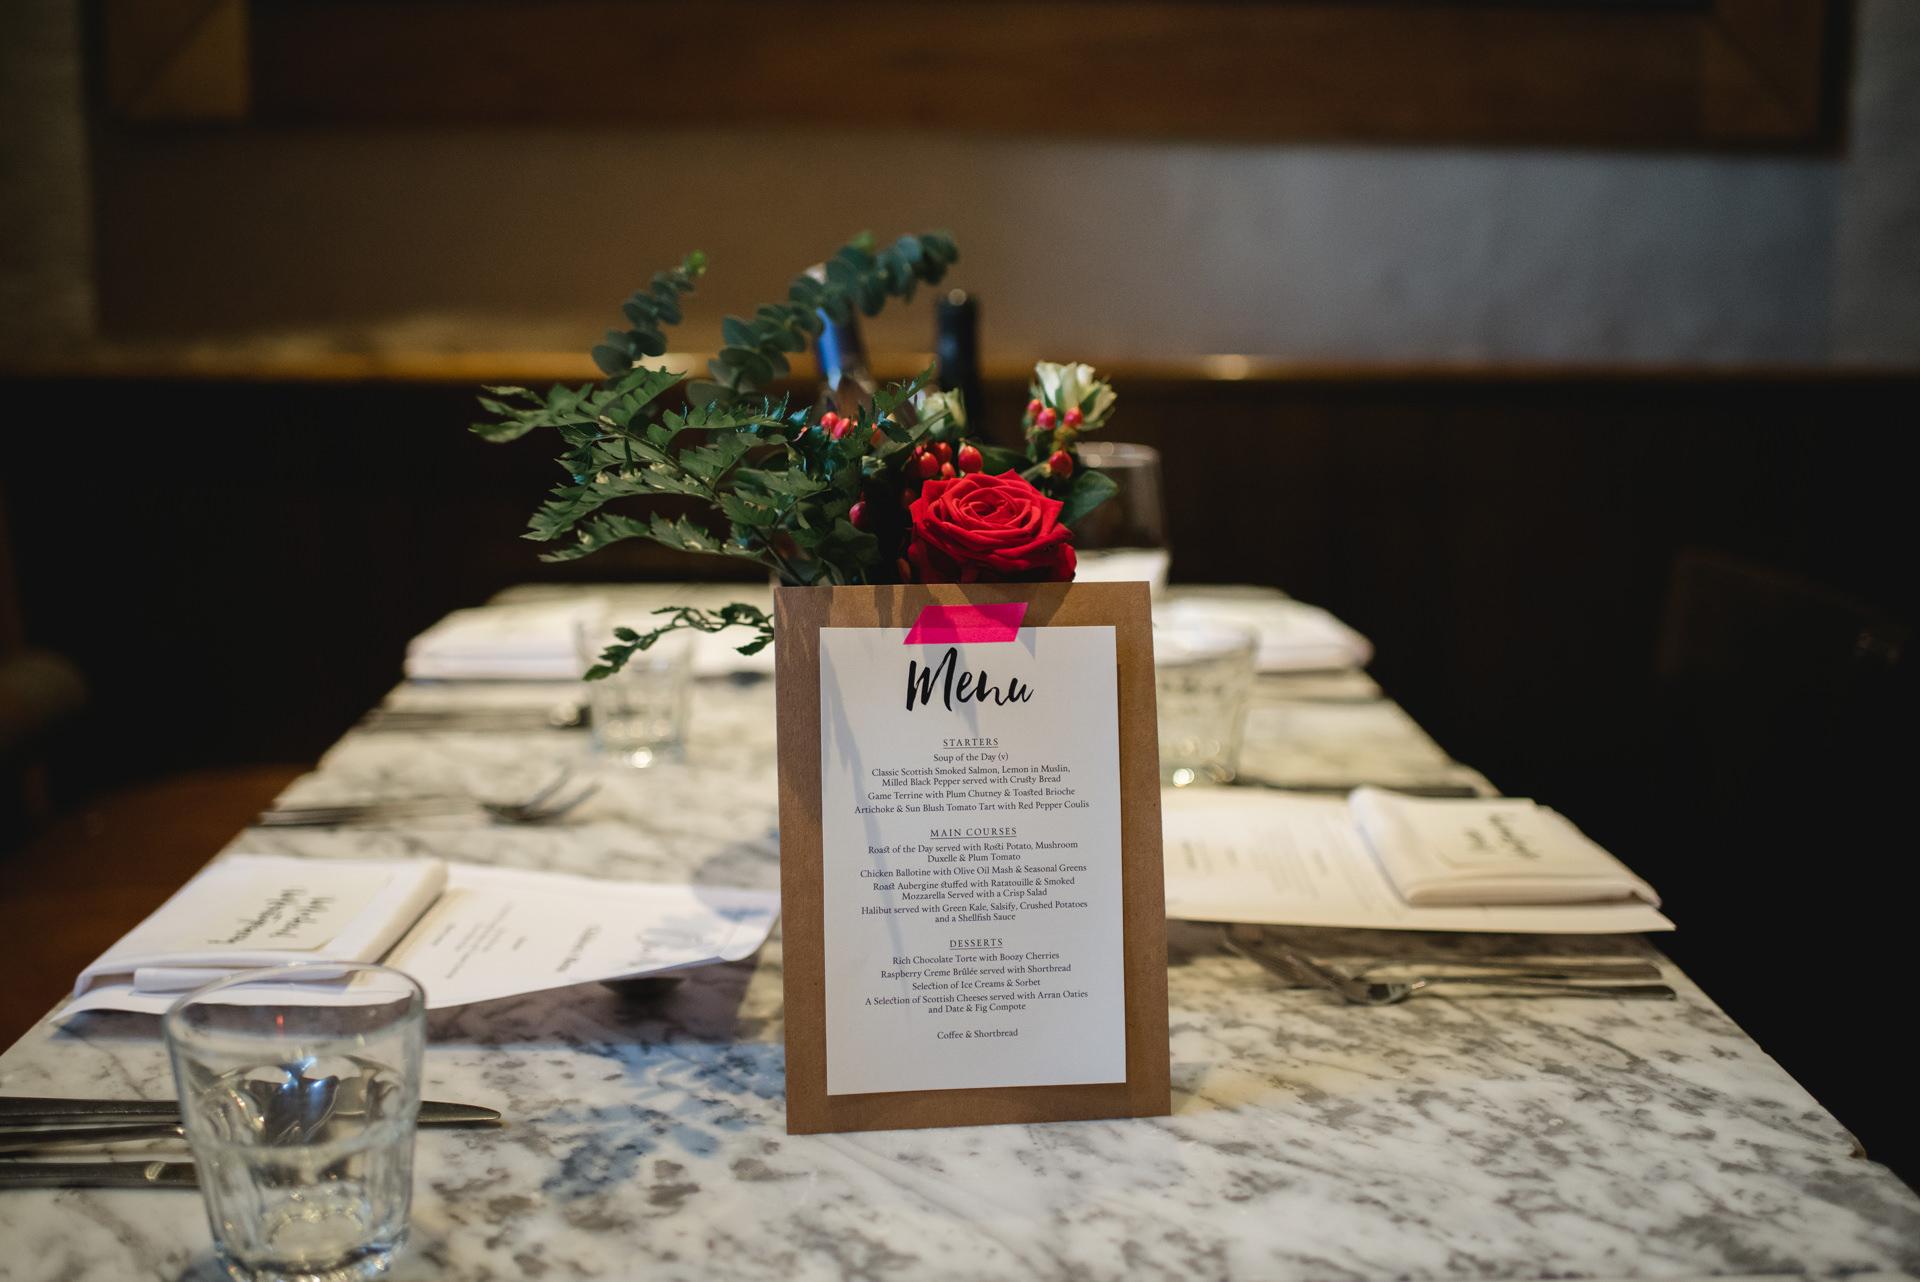 Glasgow,Glasgow registy office,Mack Photo,Photography,Wedding,bloomingwales,brasserie,centre,city,dress,end,flowers,oran mor wedding photographer,red wedding dress,west,wild,